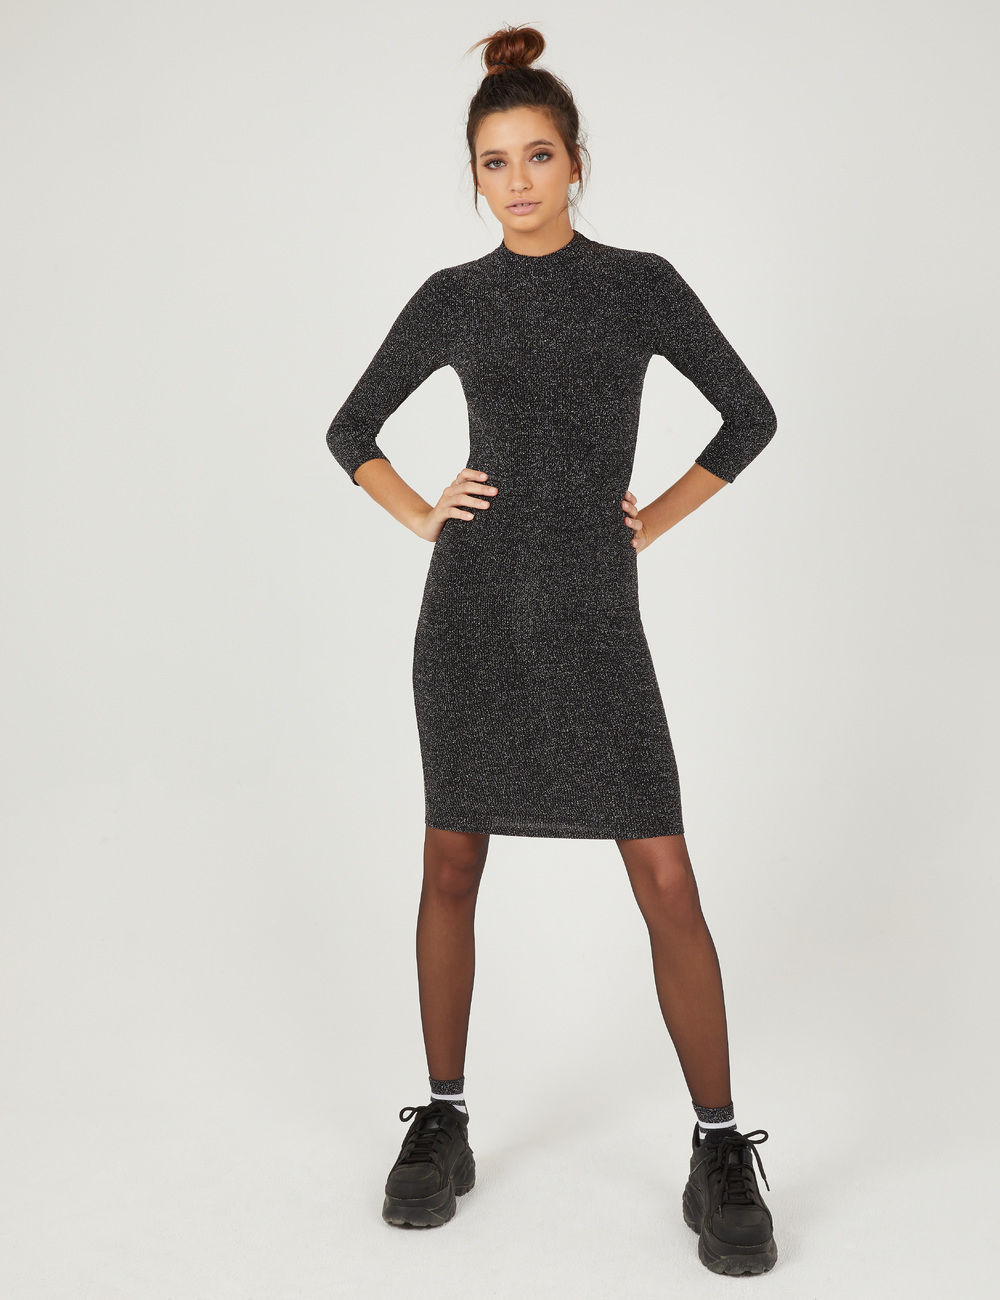 robe tube avec lurex noire et argentée Jennyfer prix 17,99 €